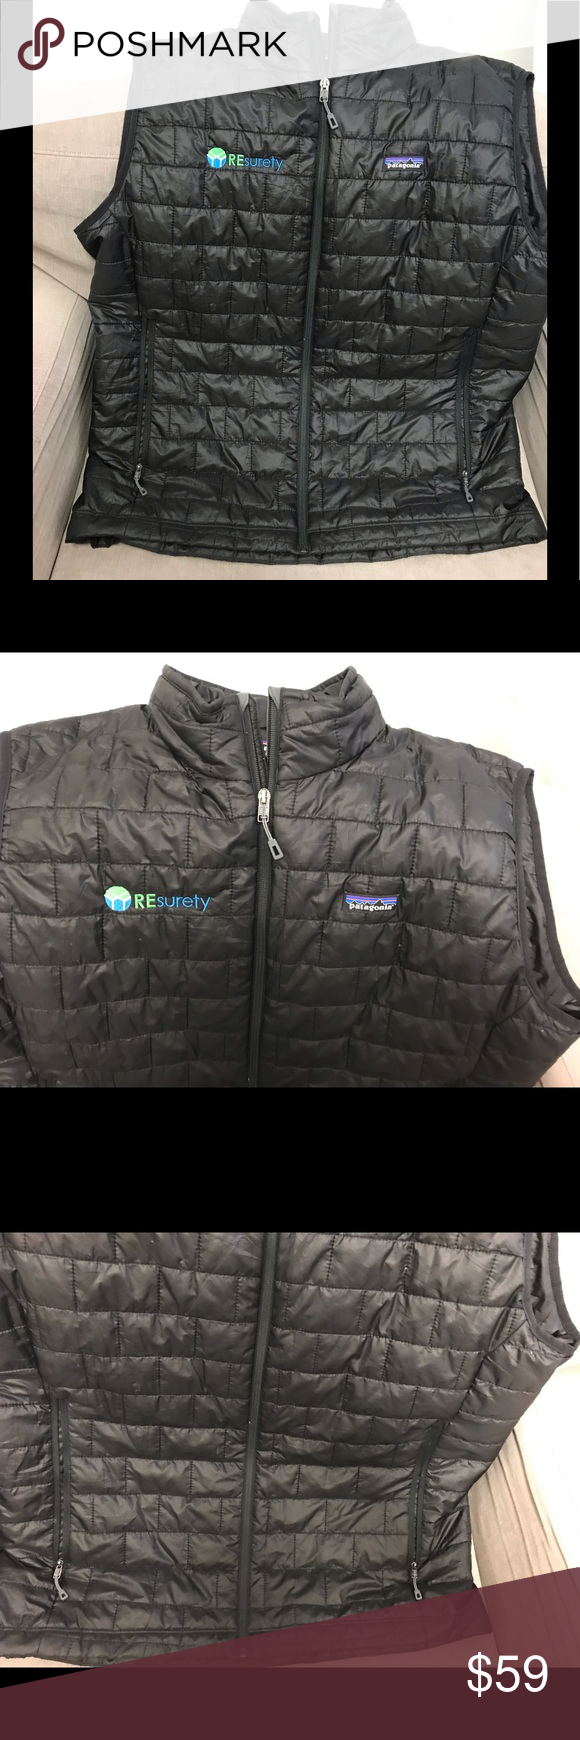 Patagonia Men's Black Vest with Logo Patagonia mens